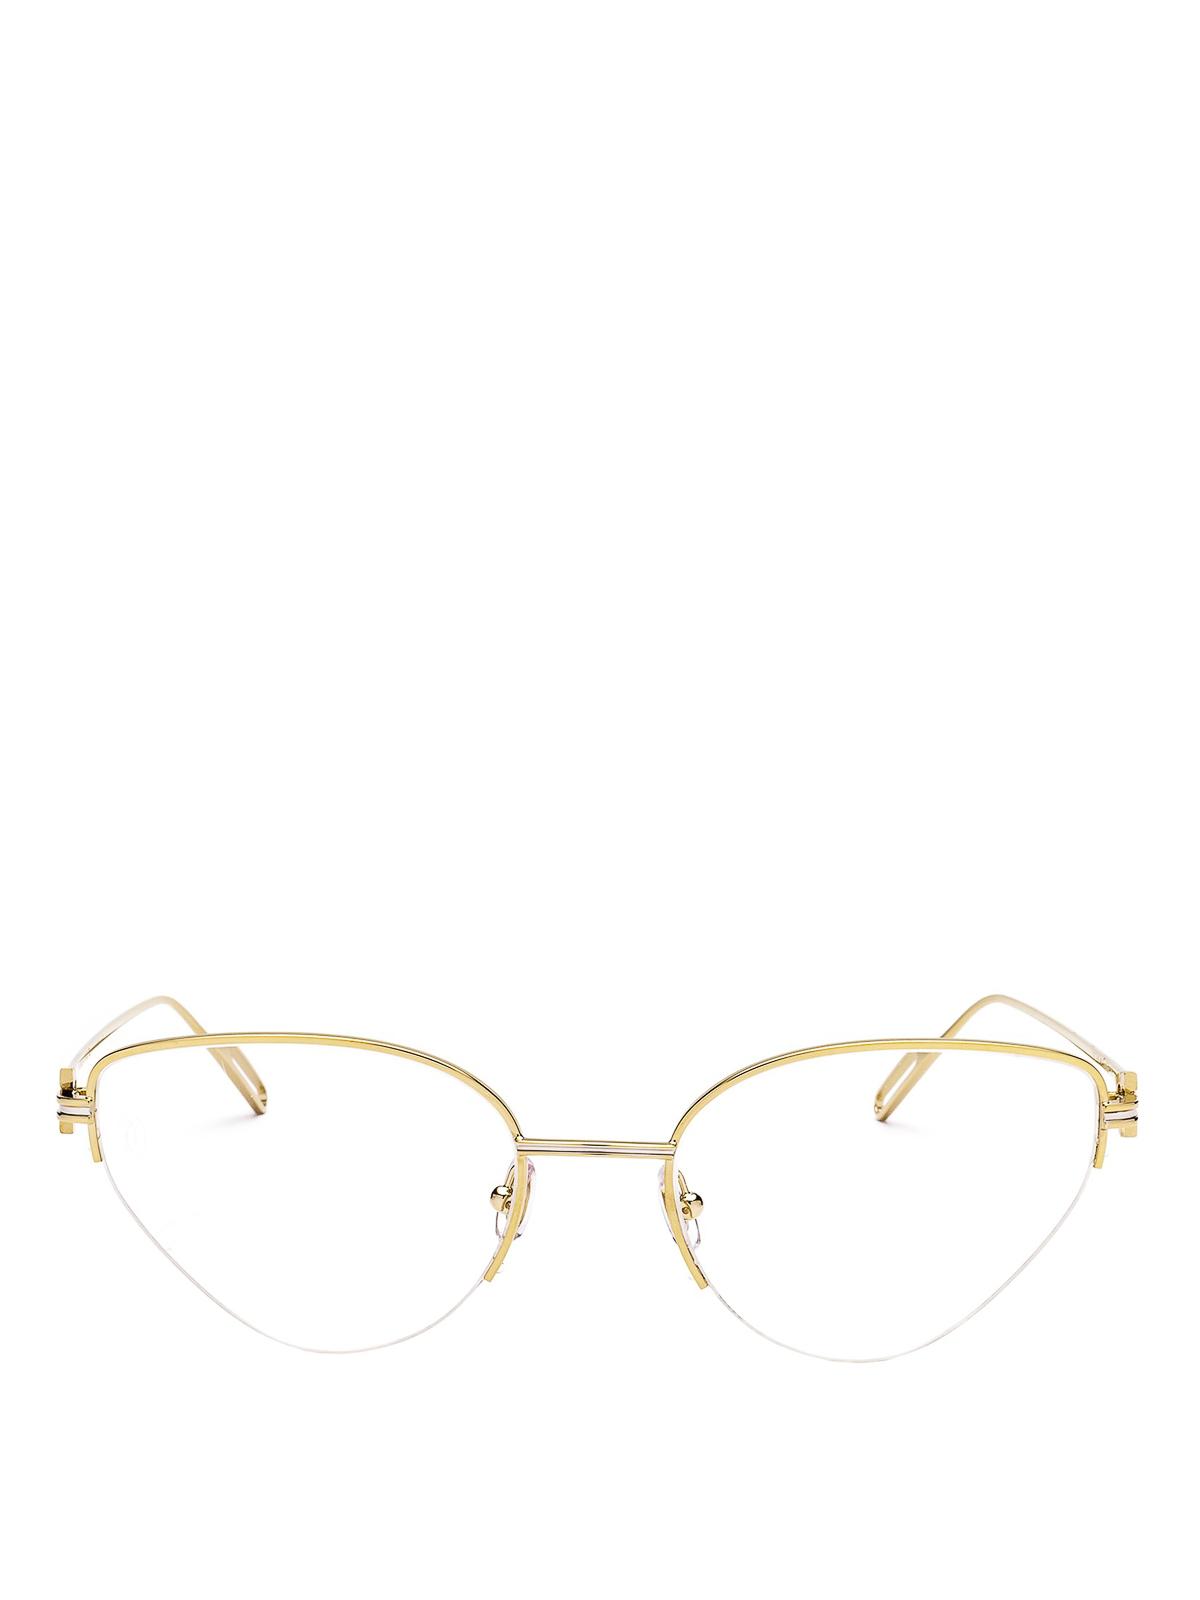 a1108e5cfd68 iKRIX CARTIER  Glasses - Gold-tone half-frame aviator eyeglasses